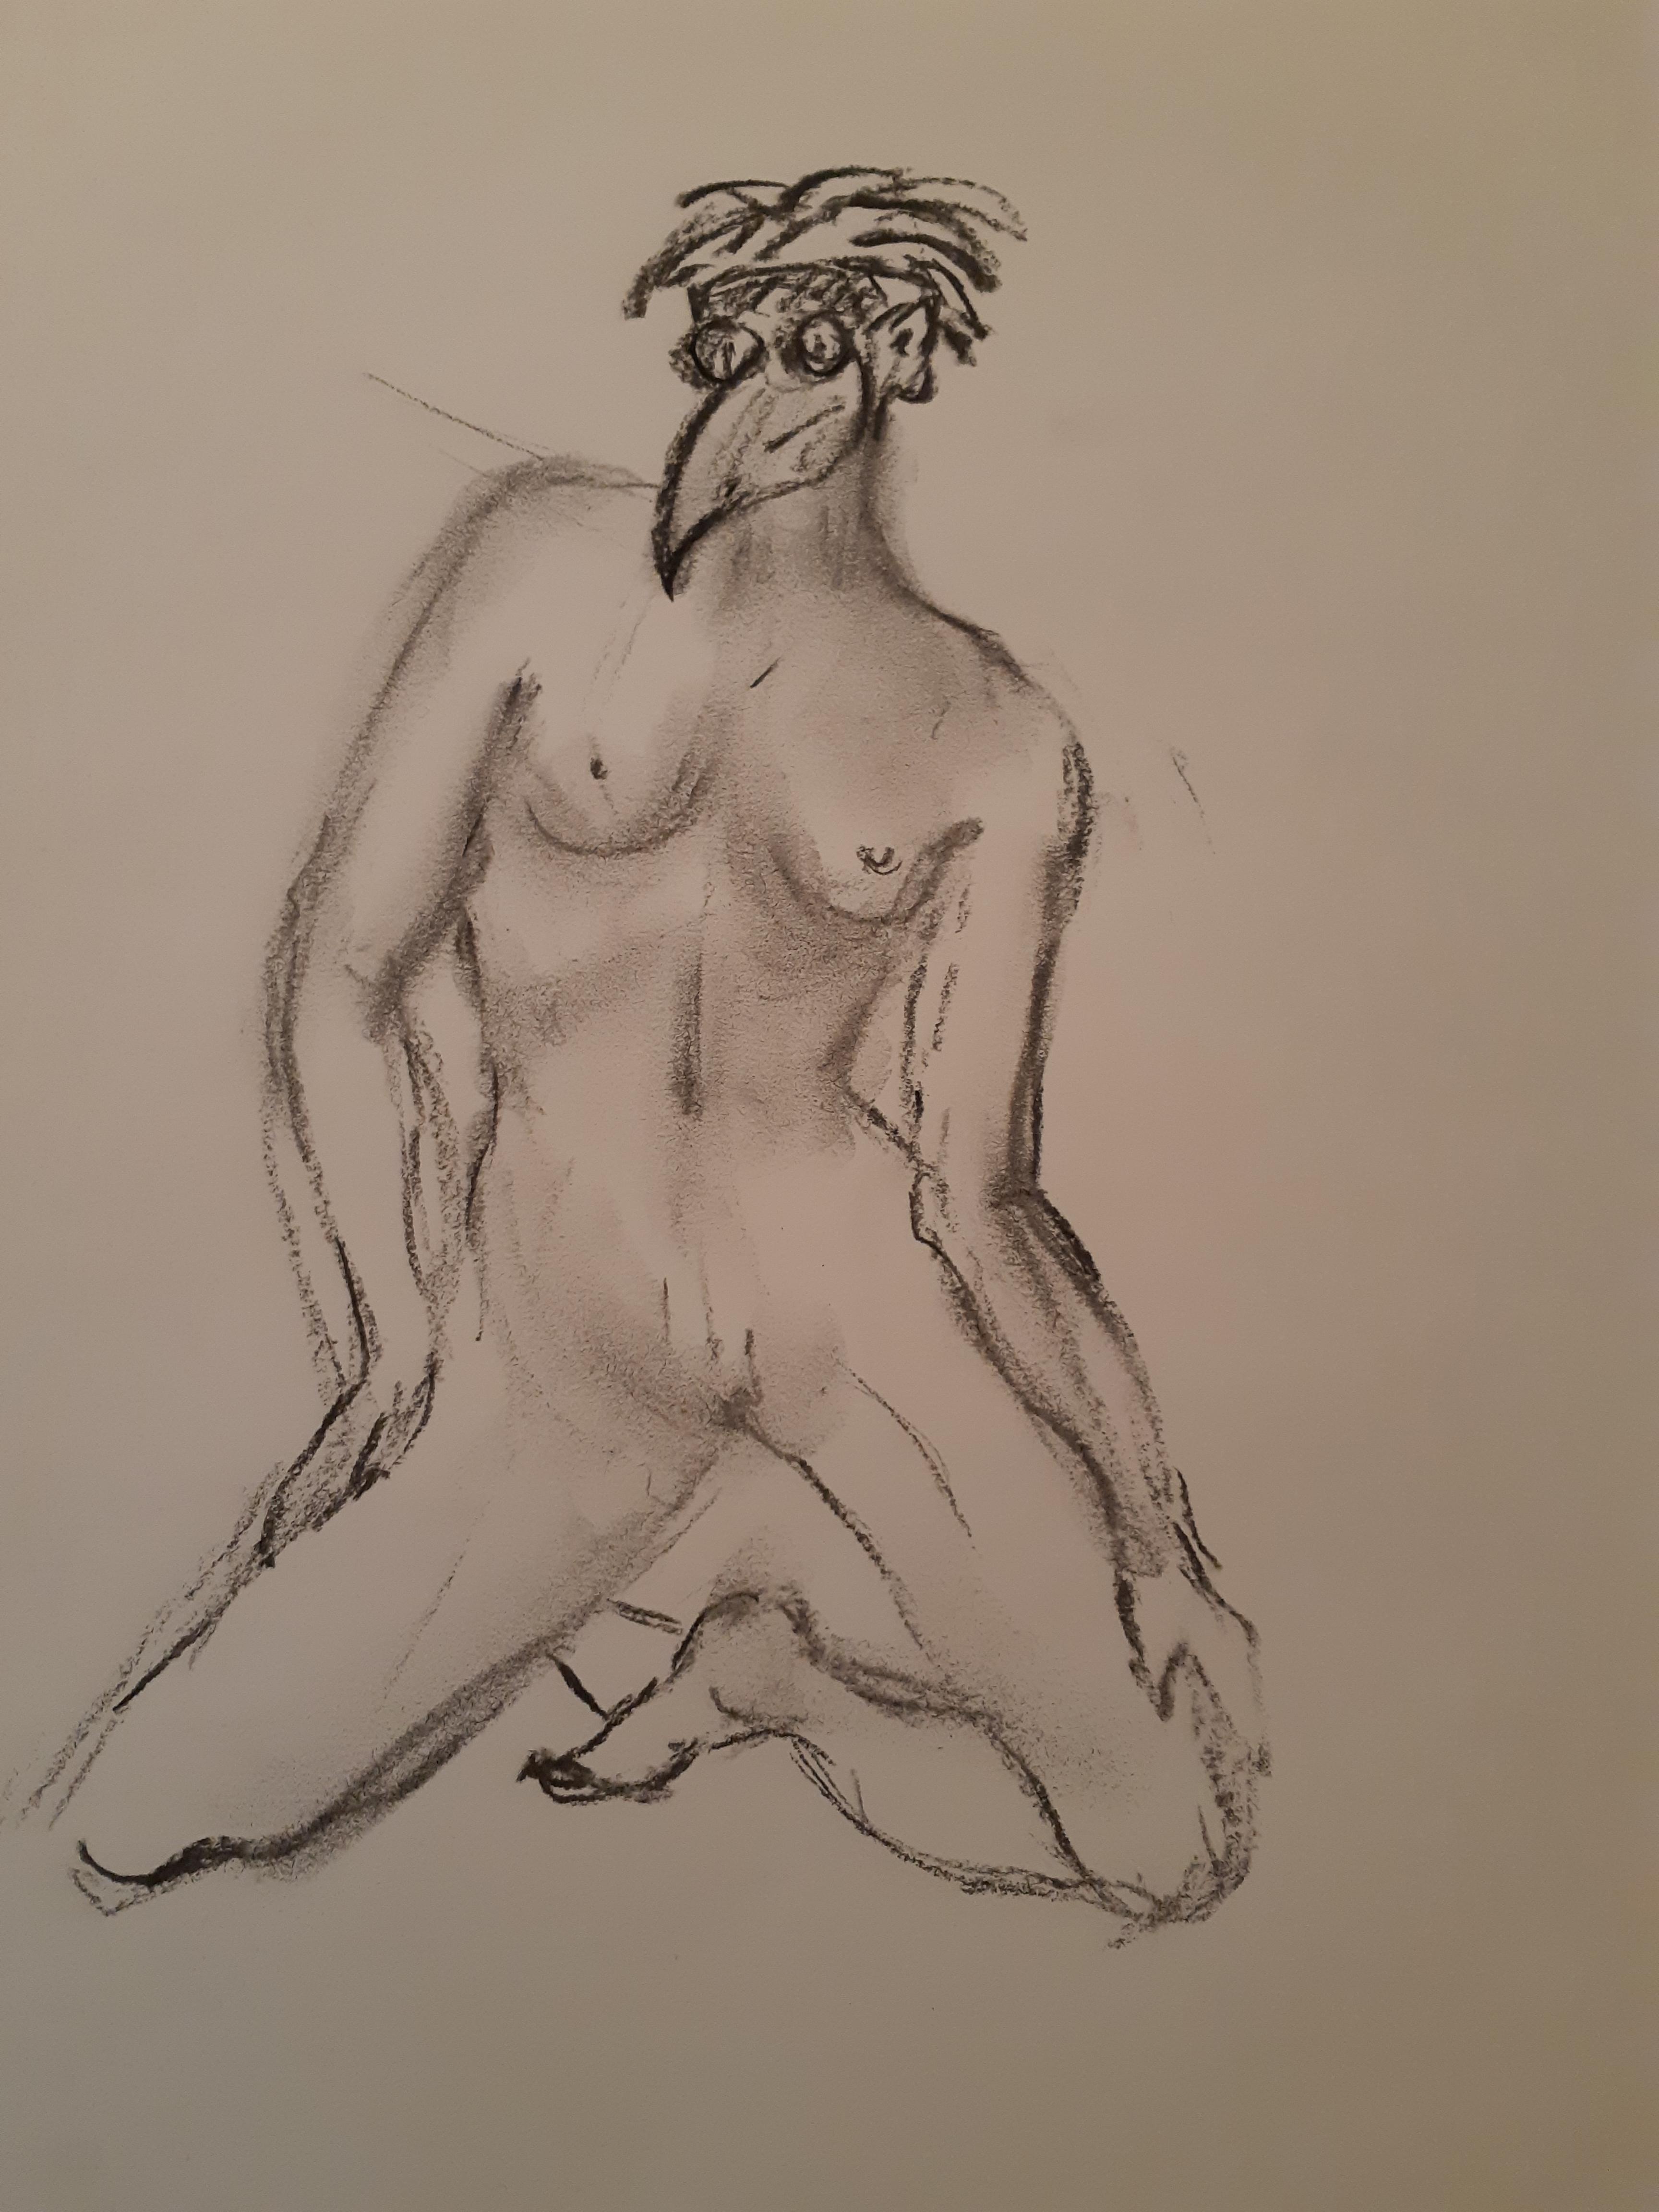 M�decin l'apaise dessin nu fusain  cours de dessin